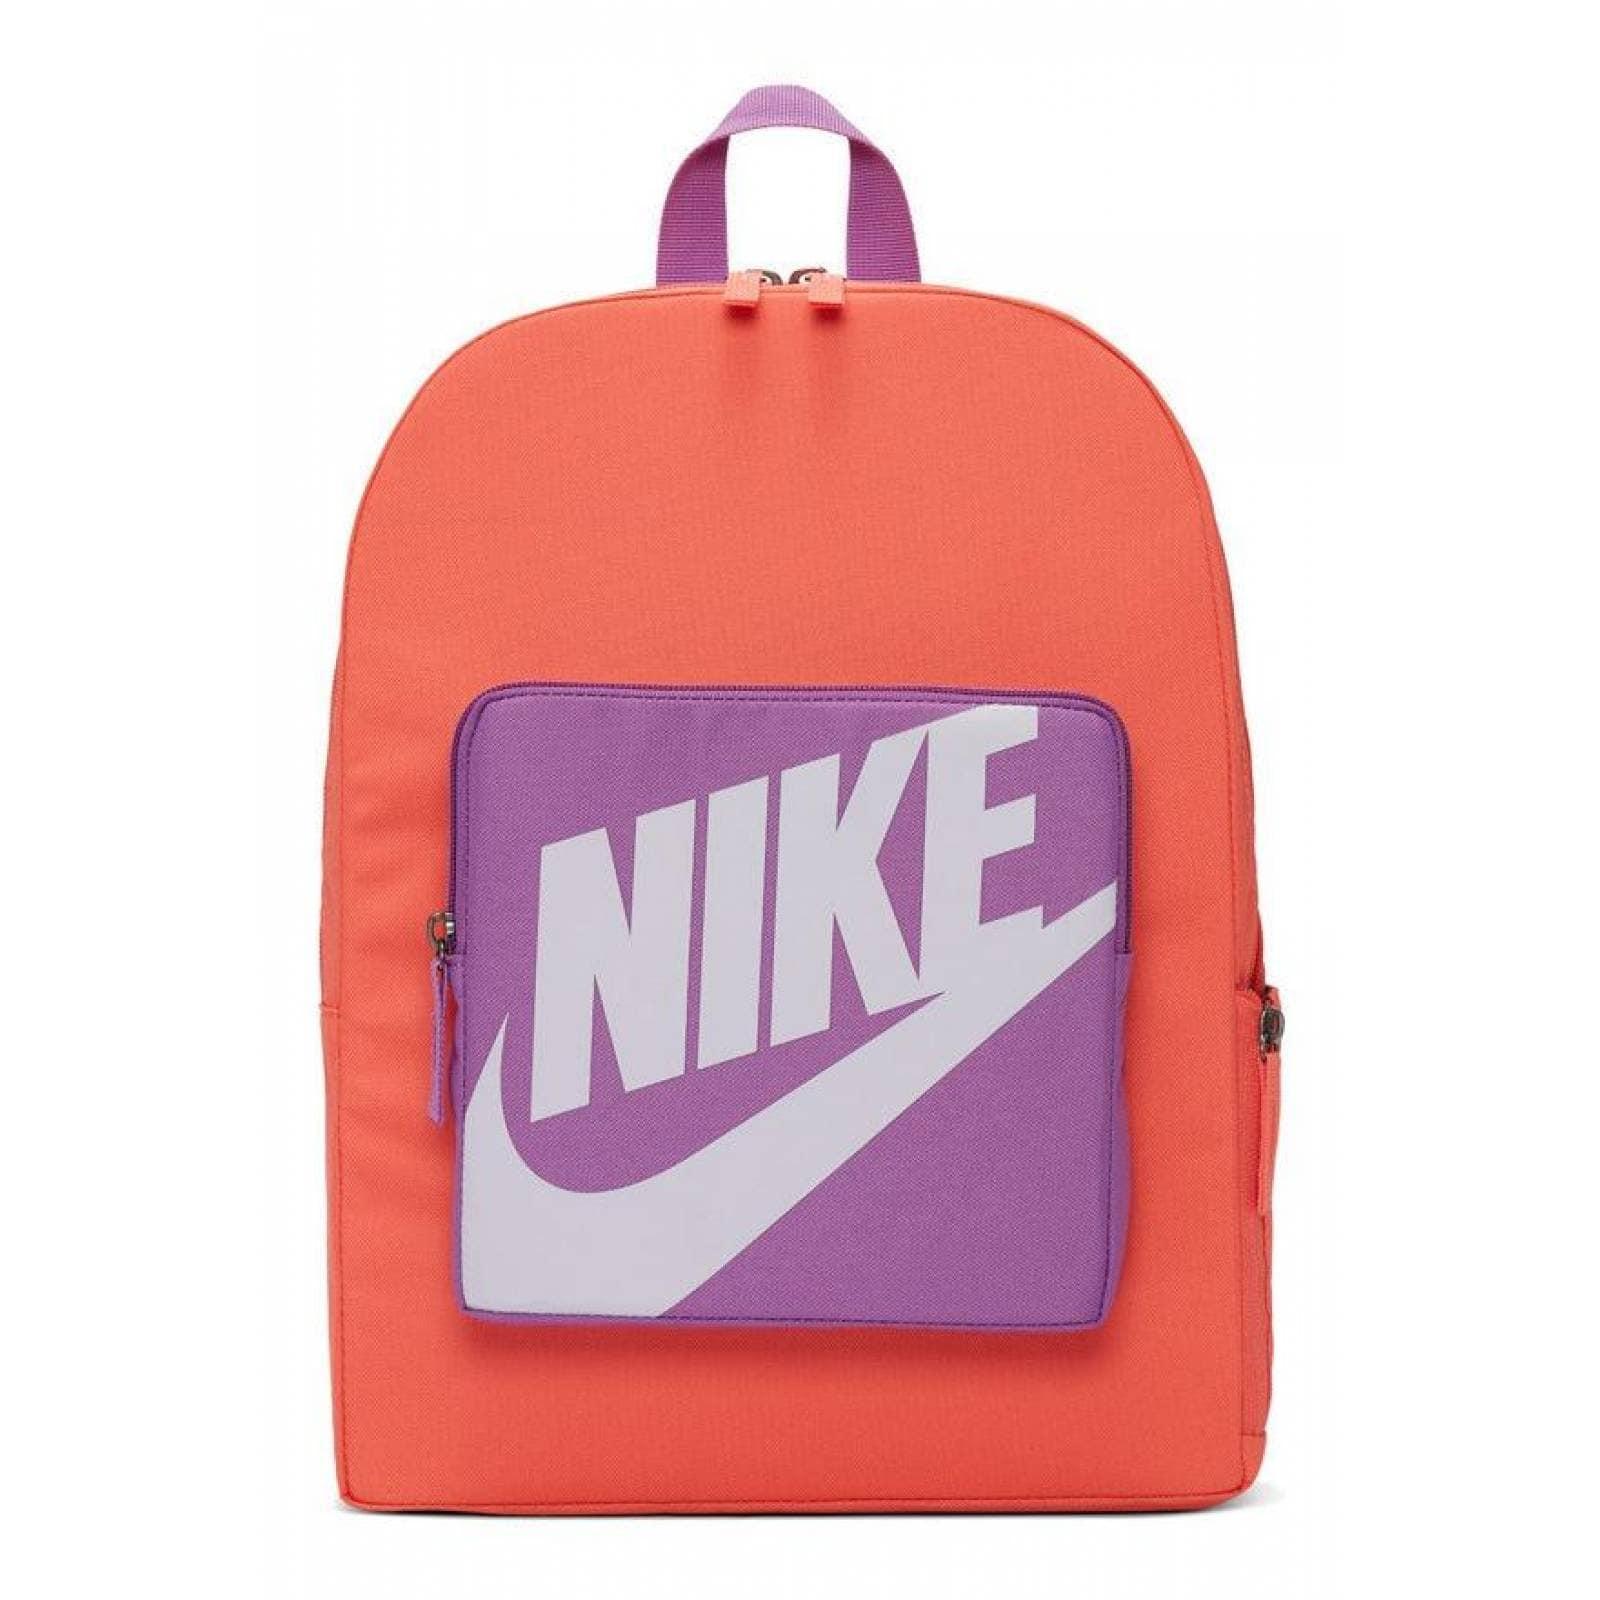 Excesivo Paja acoso  Mochila Nike Classic para Niña/Mujer BA5928-814